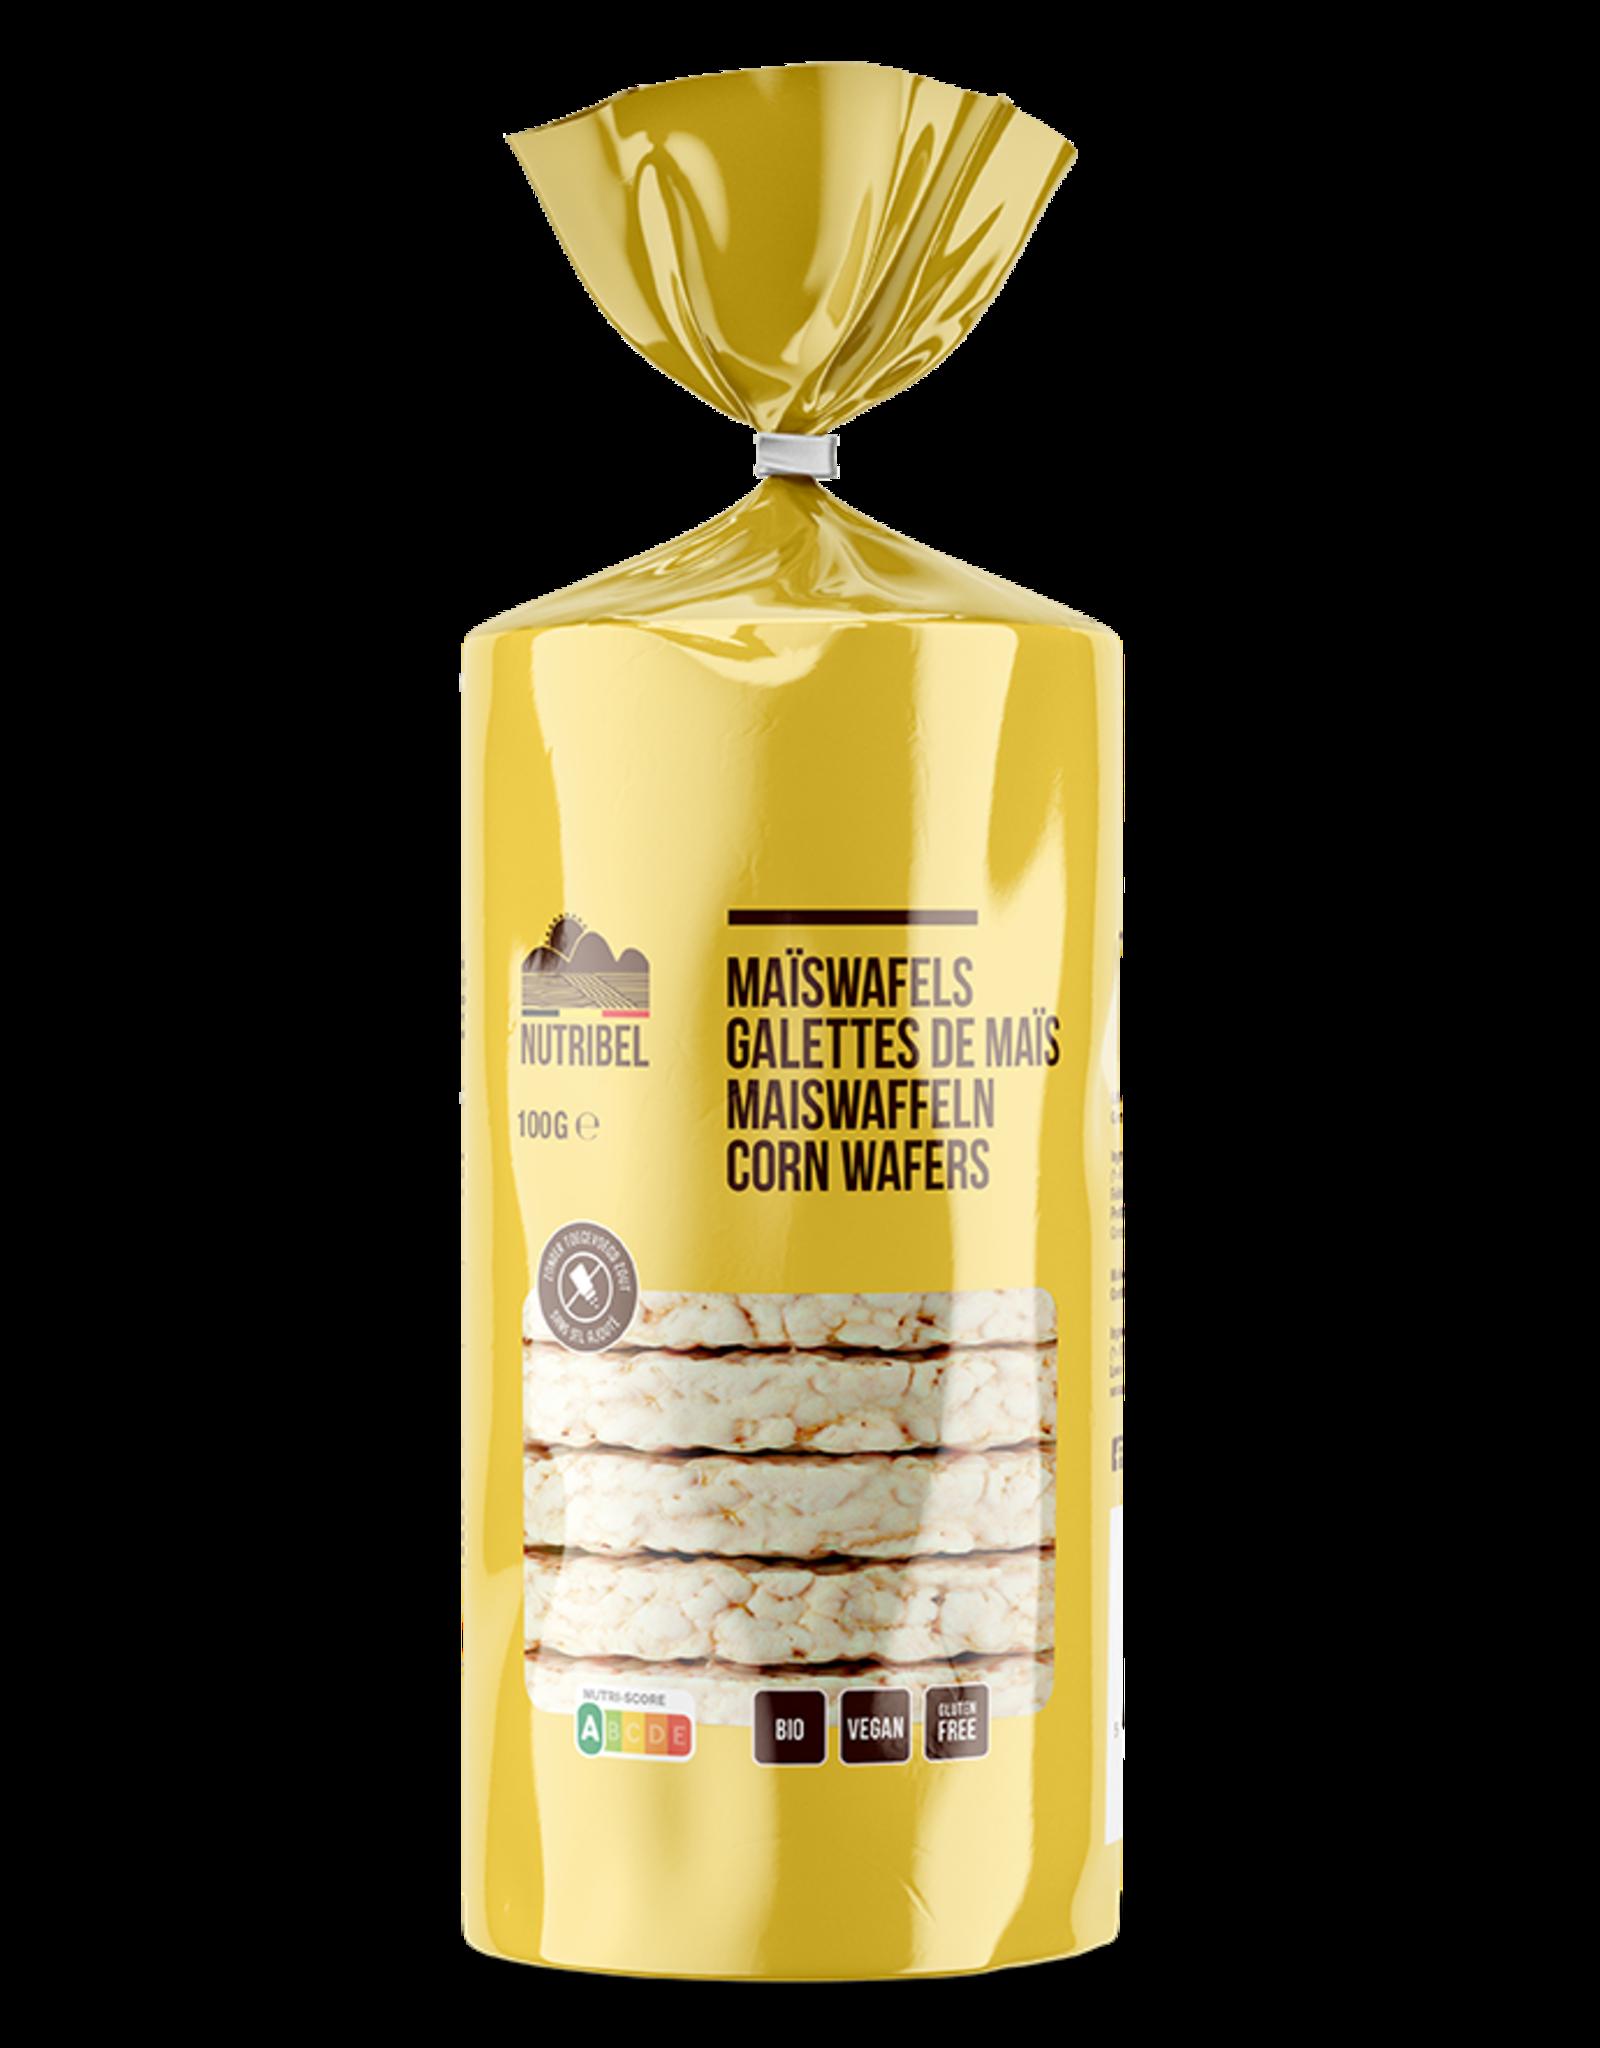 Nutribel Maïswafels zz bio & glutenvrij 100g